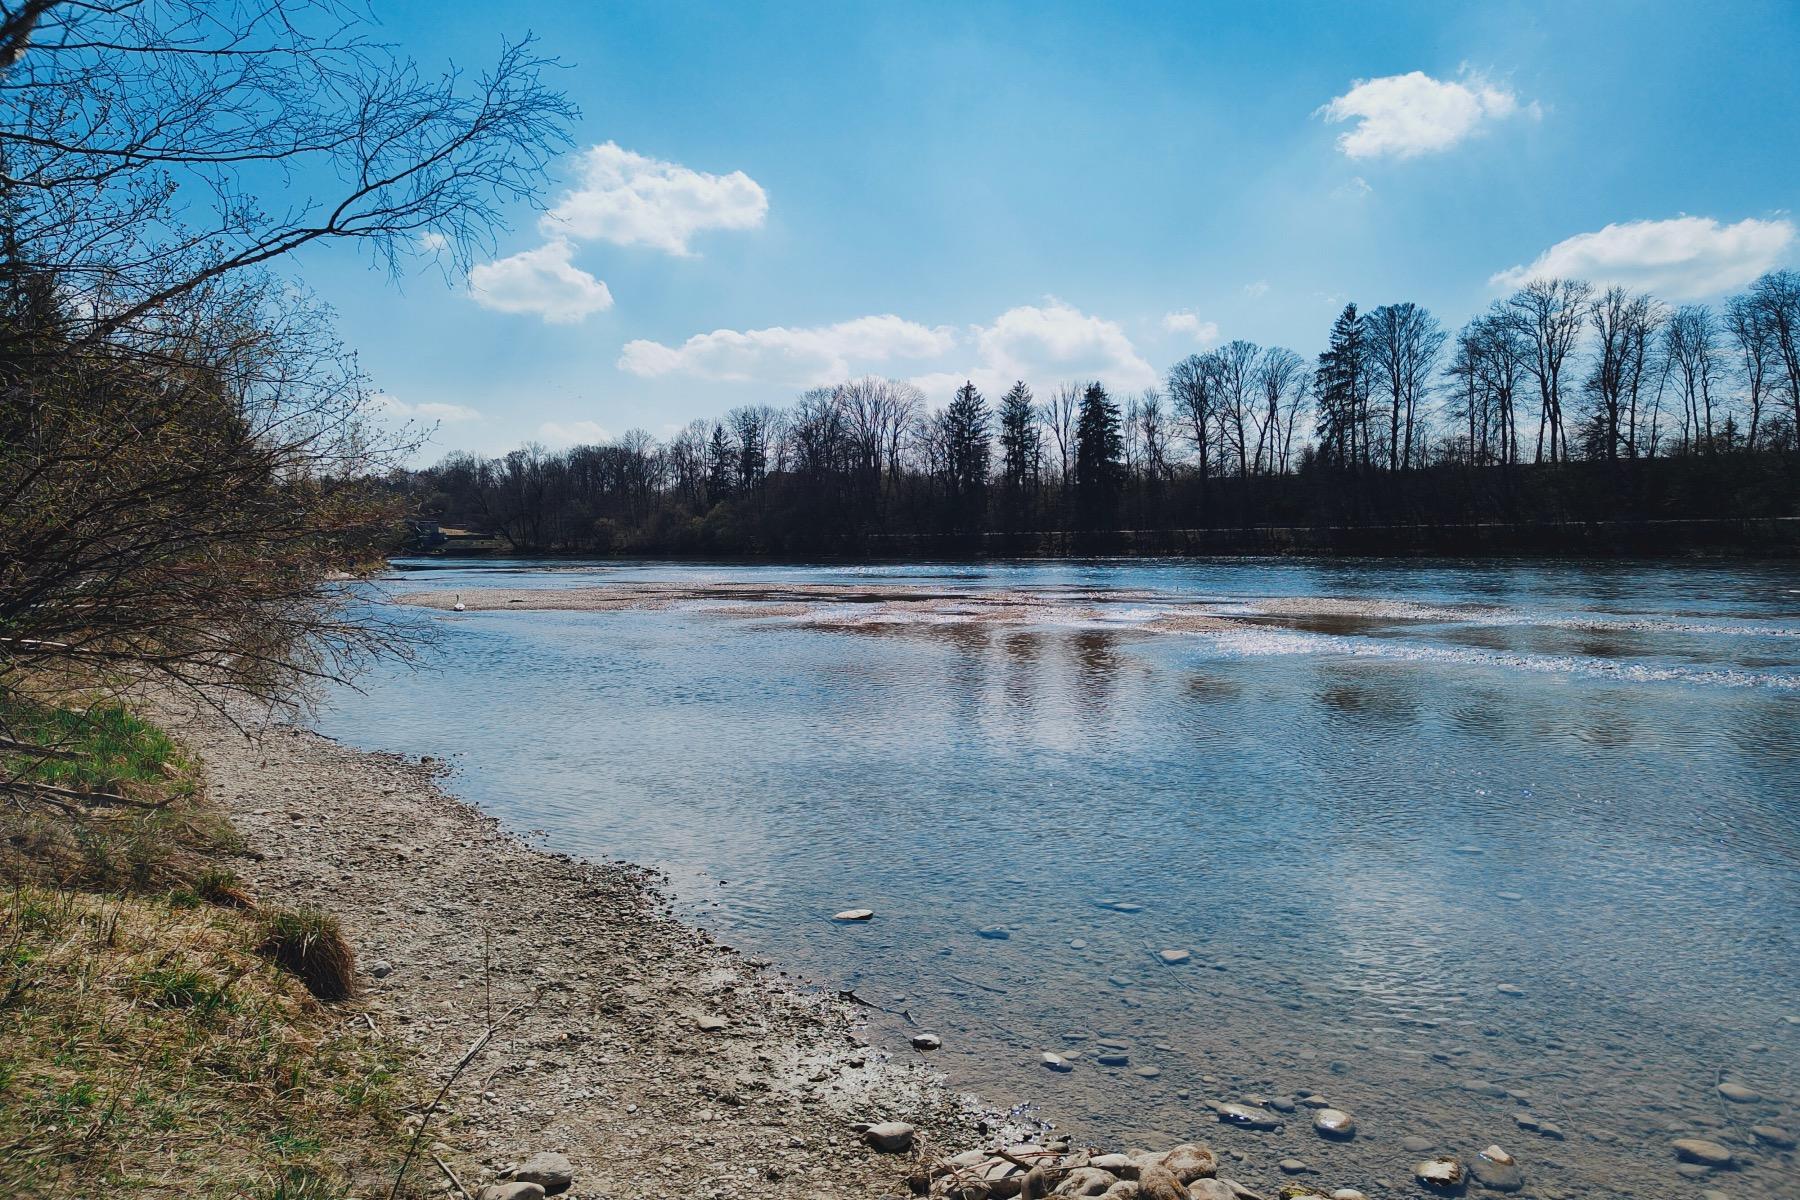 Landsberger Wildpark Frühjahr 7 Blick auf den Lech 2 Lechufer